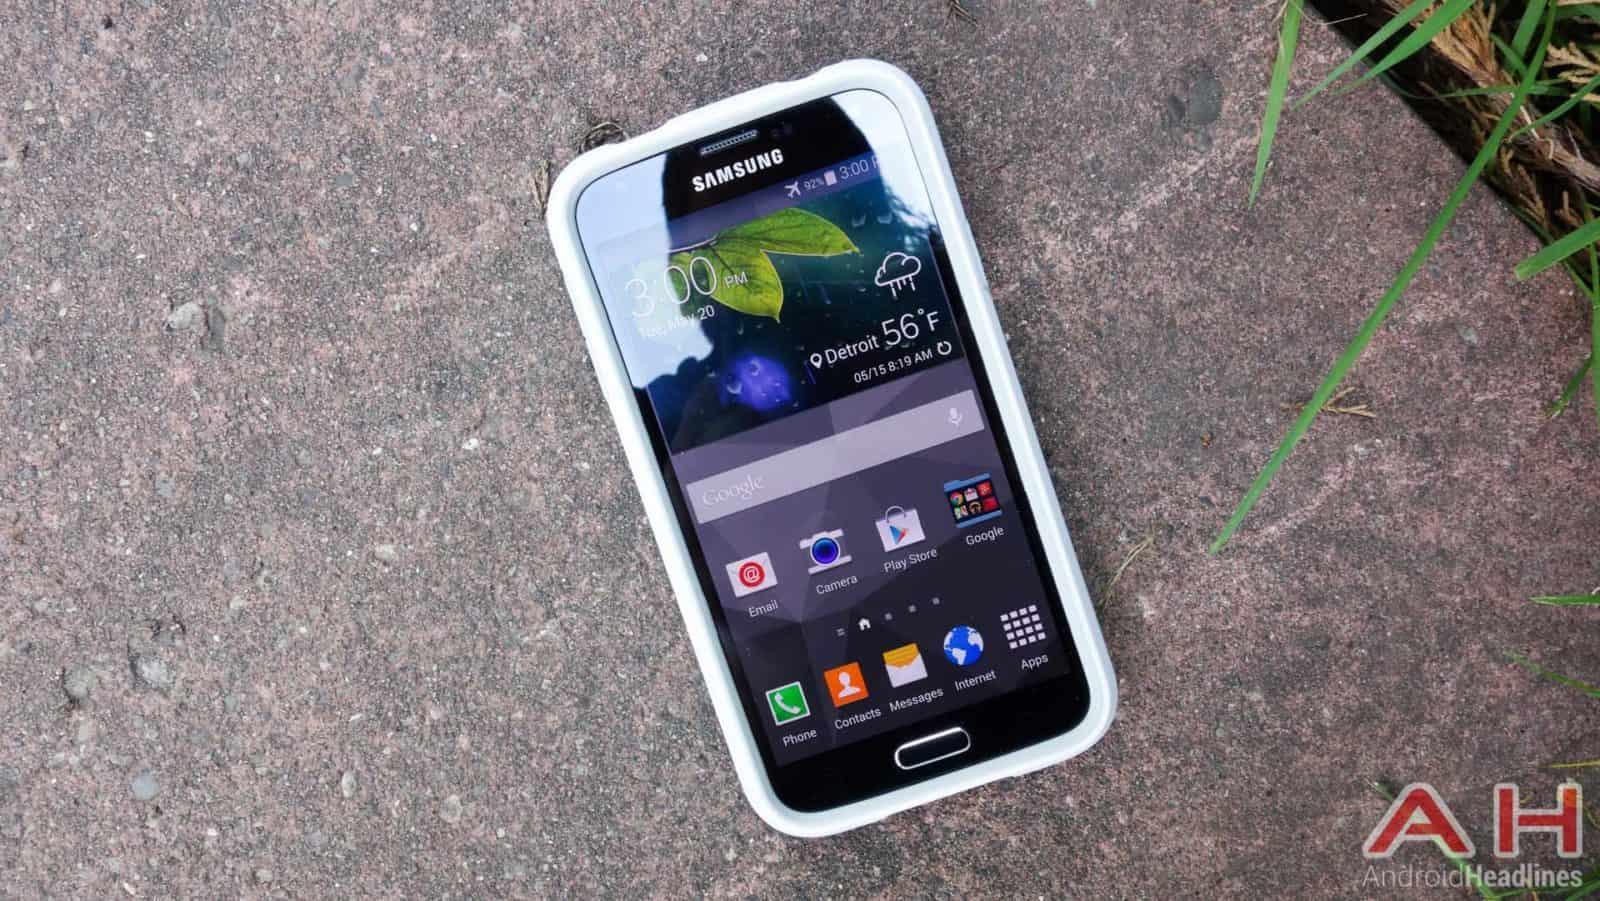 Samsung-Galaxy-S5-Pelican-Voyager-Case-Review-AH-3